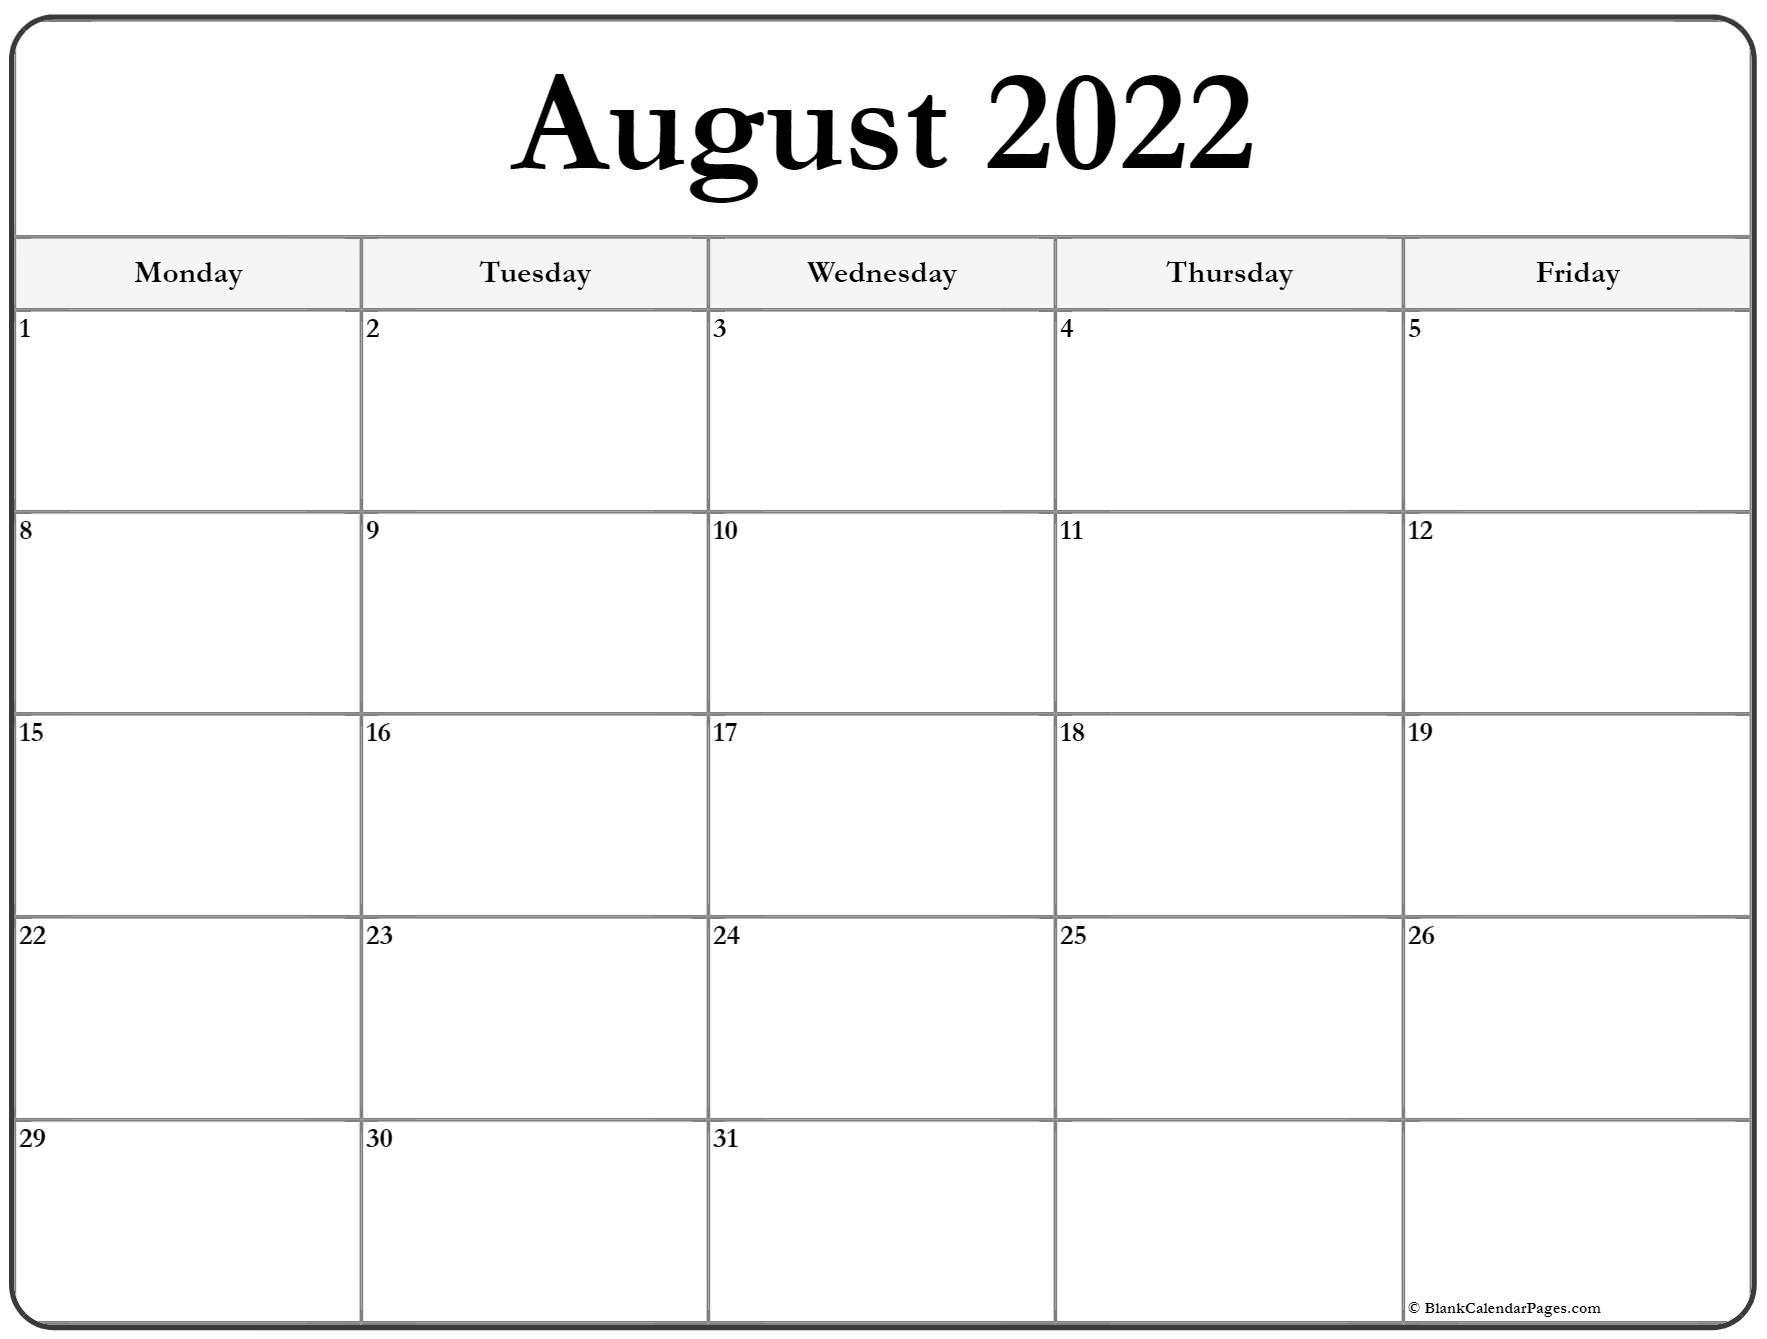 August 2022 Monday Calendar | Monday To Sunday